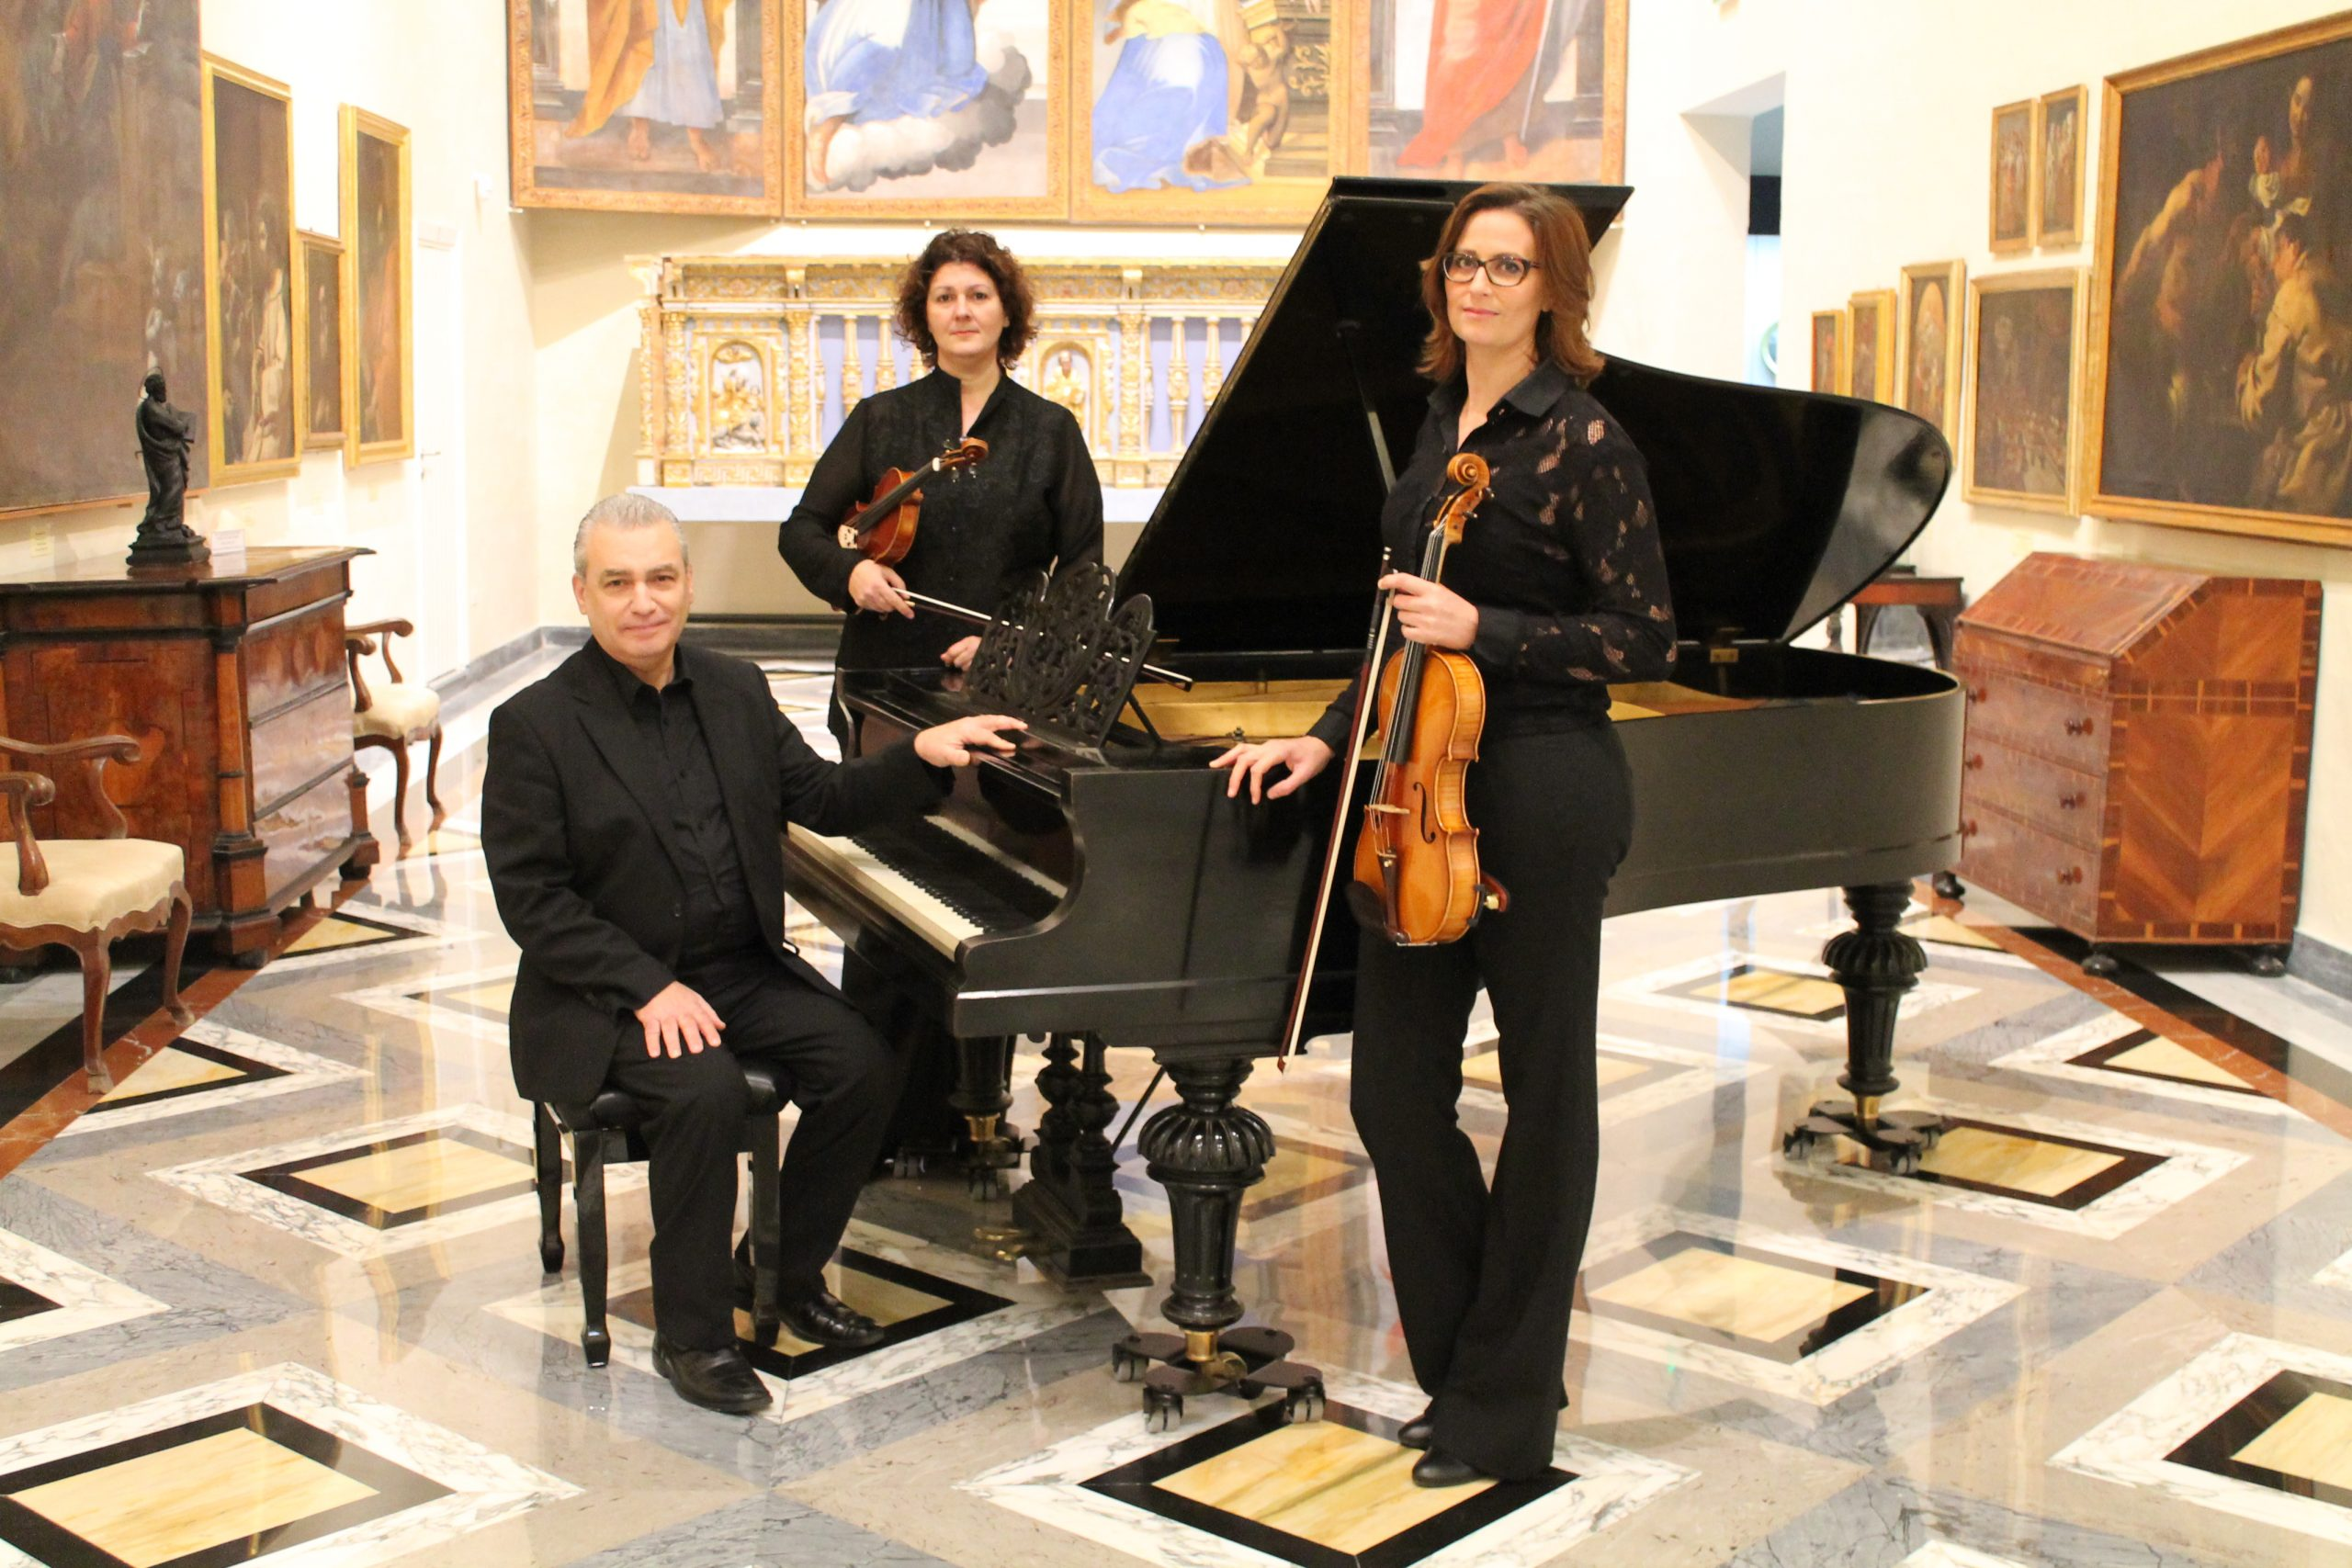 MPO Trio performinc Classical Music at San Anton Palace